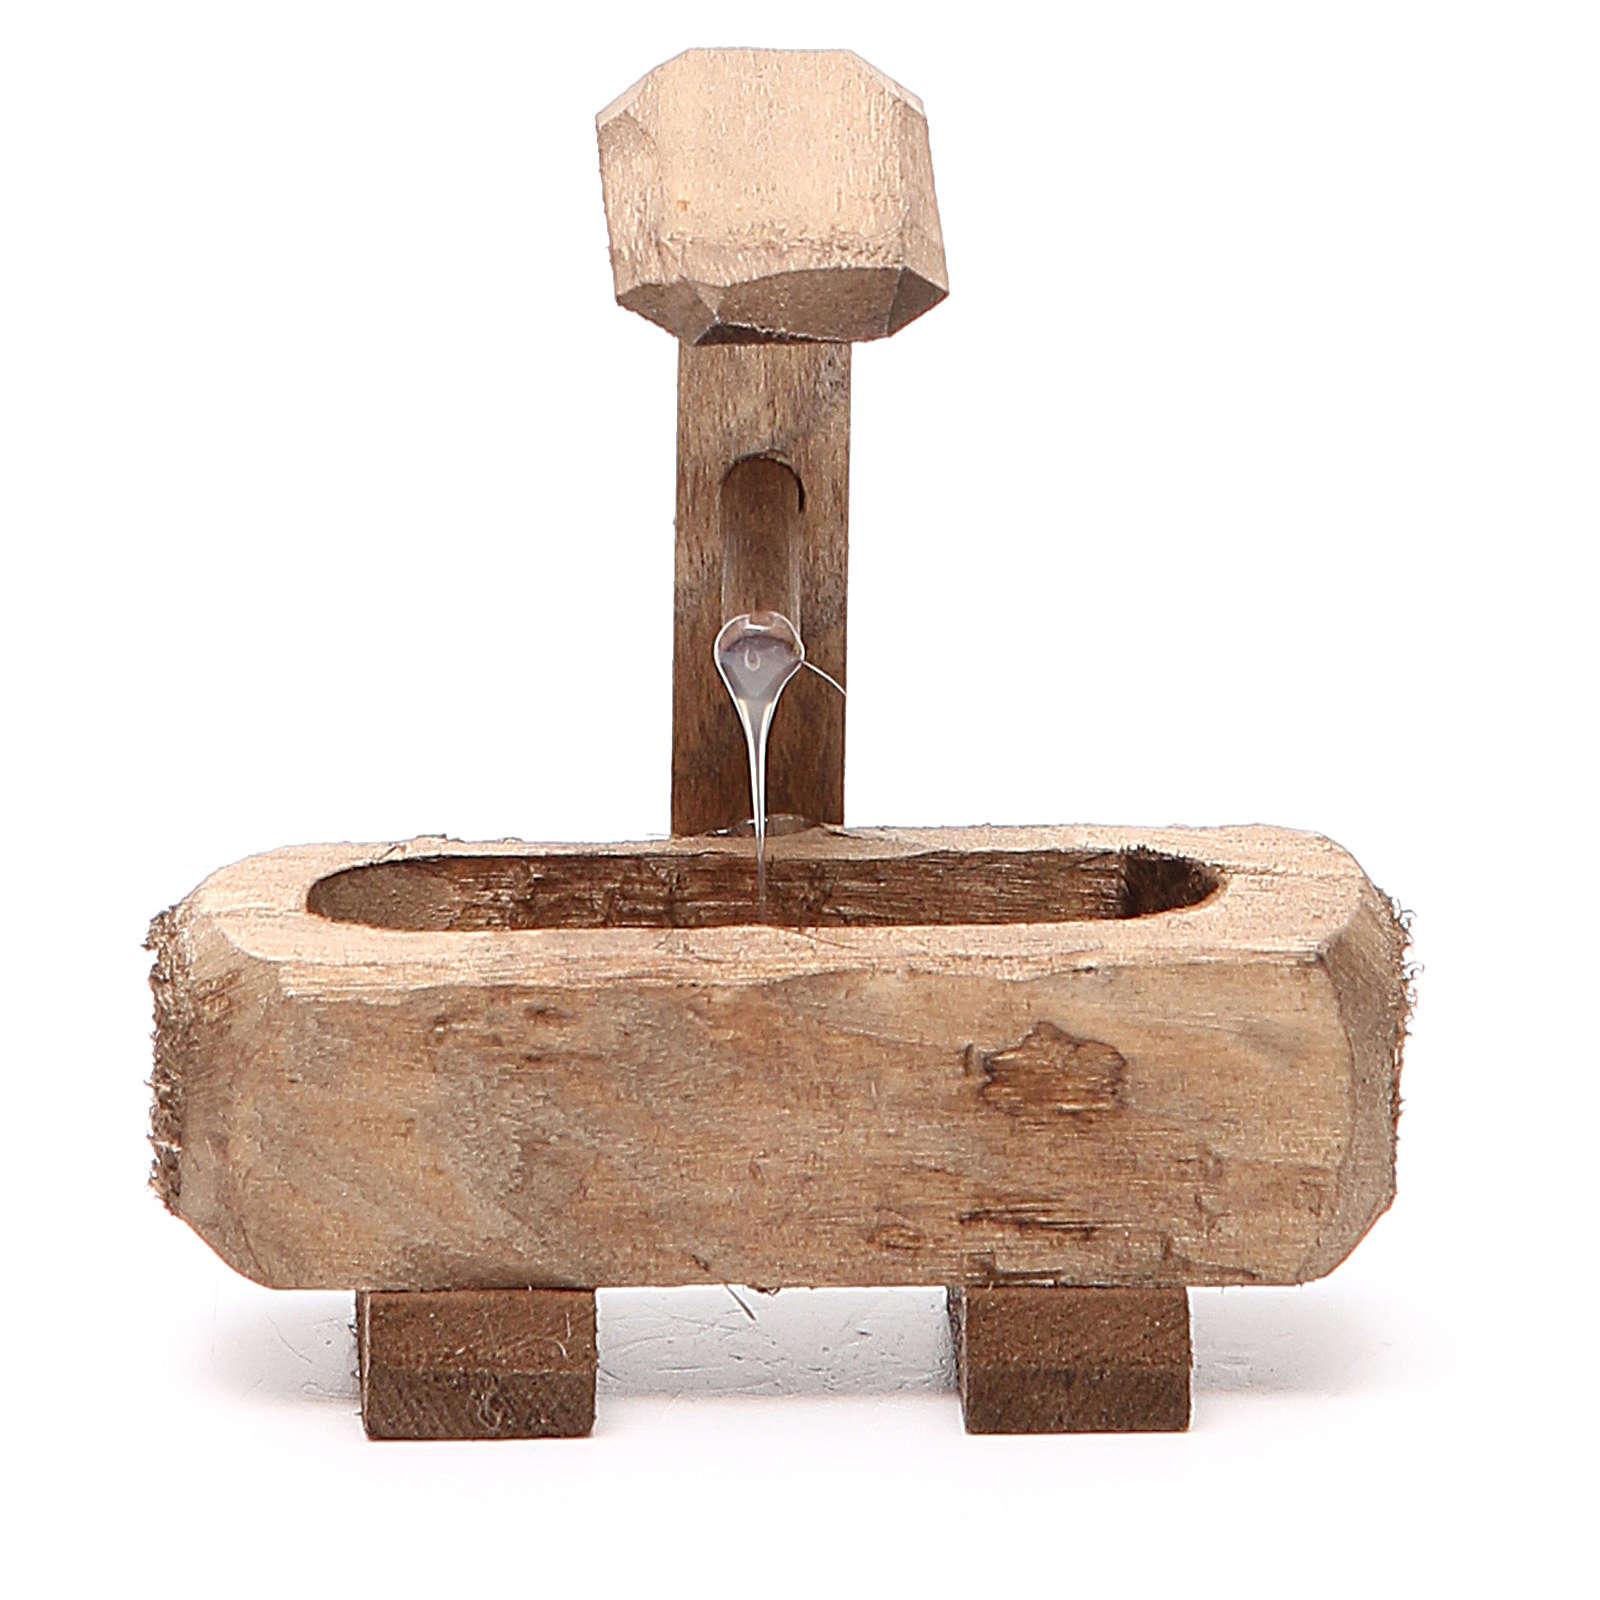 Small Fountain for nativity dark wood 8x5x8cm 4